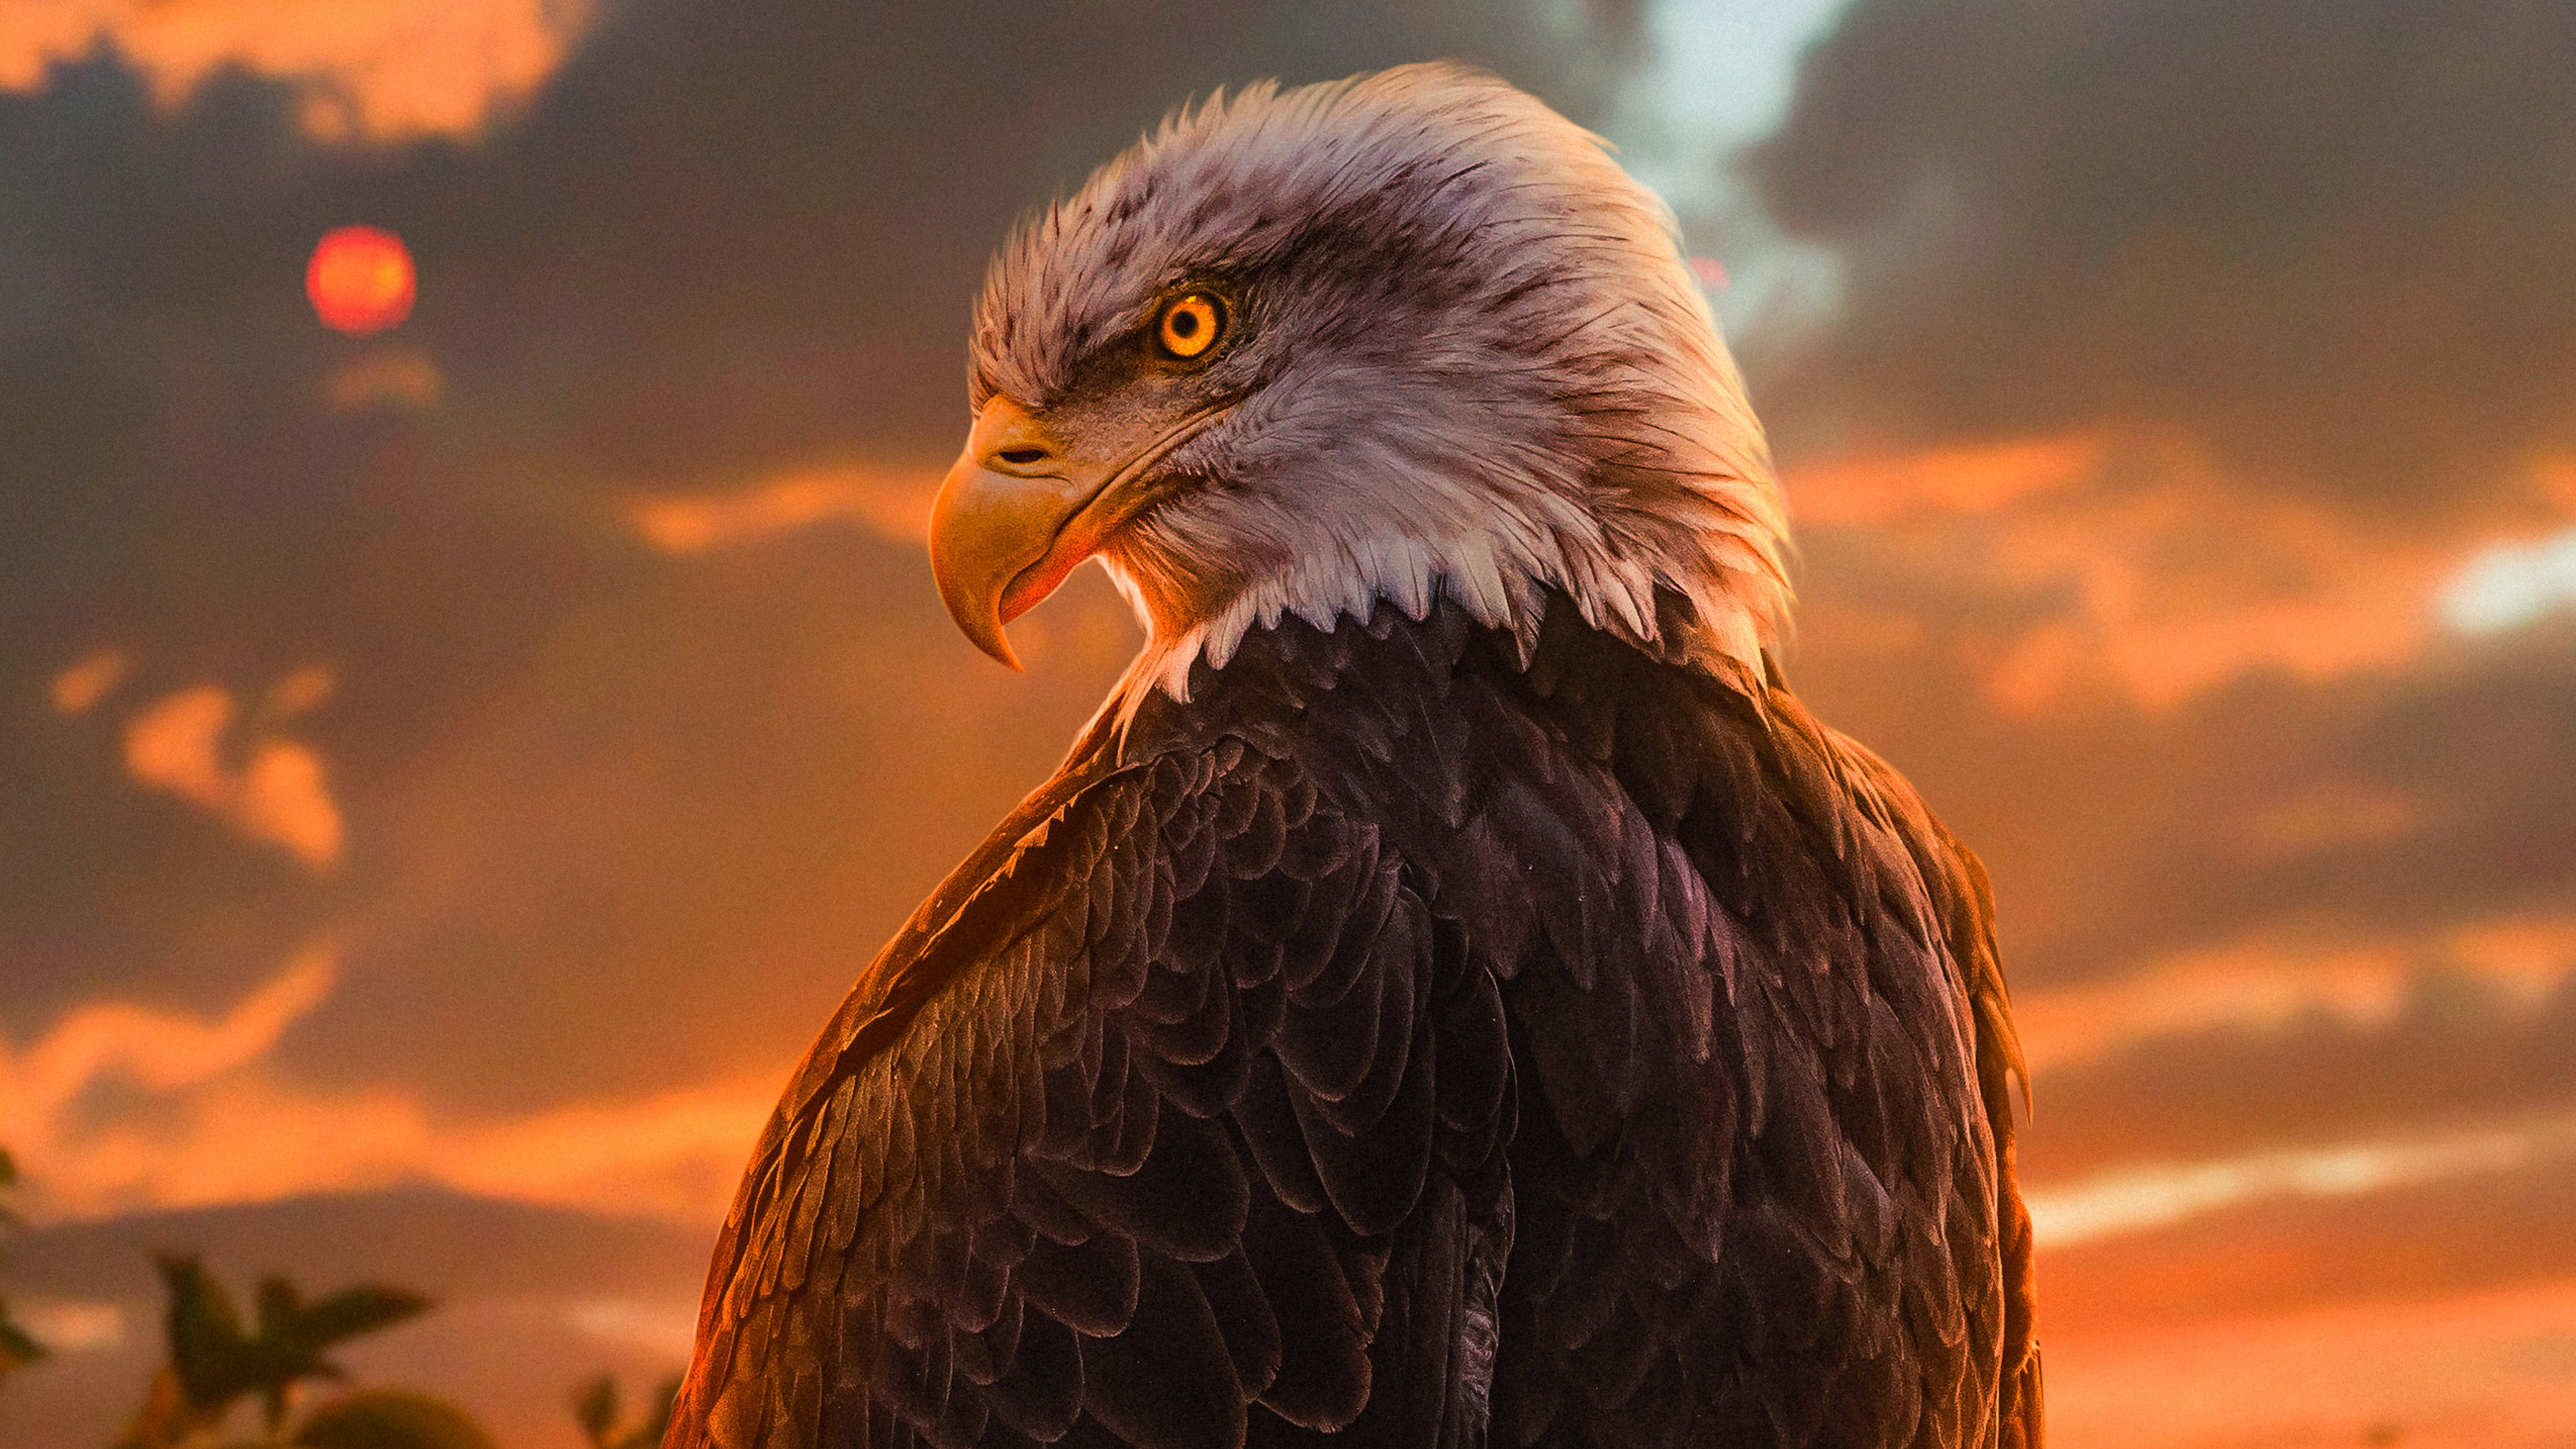 Wild Bald Eagle 4k, HD Birds, 4k Wallpapers, Images ...